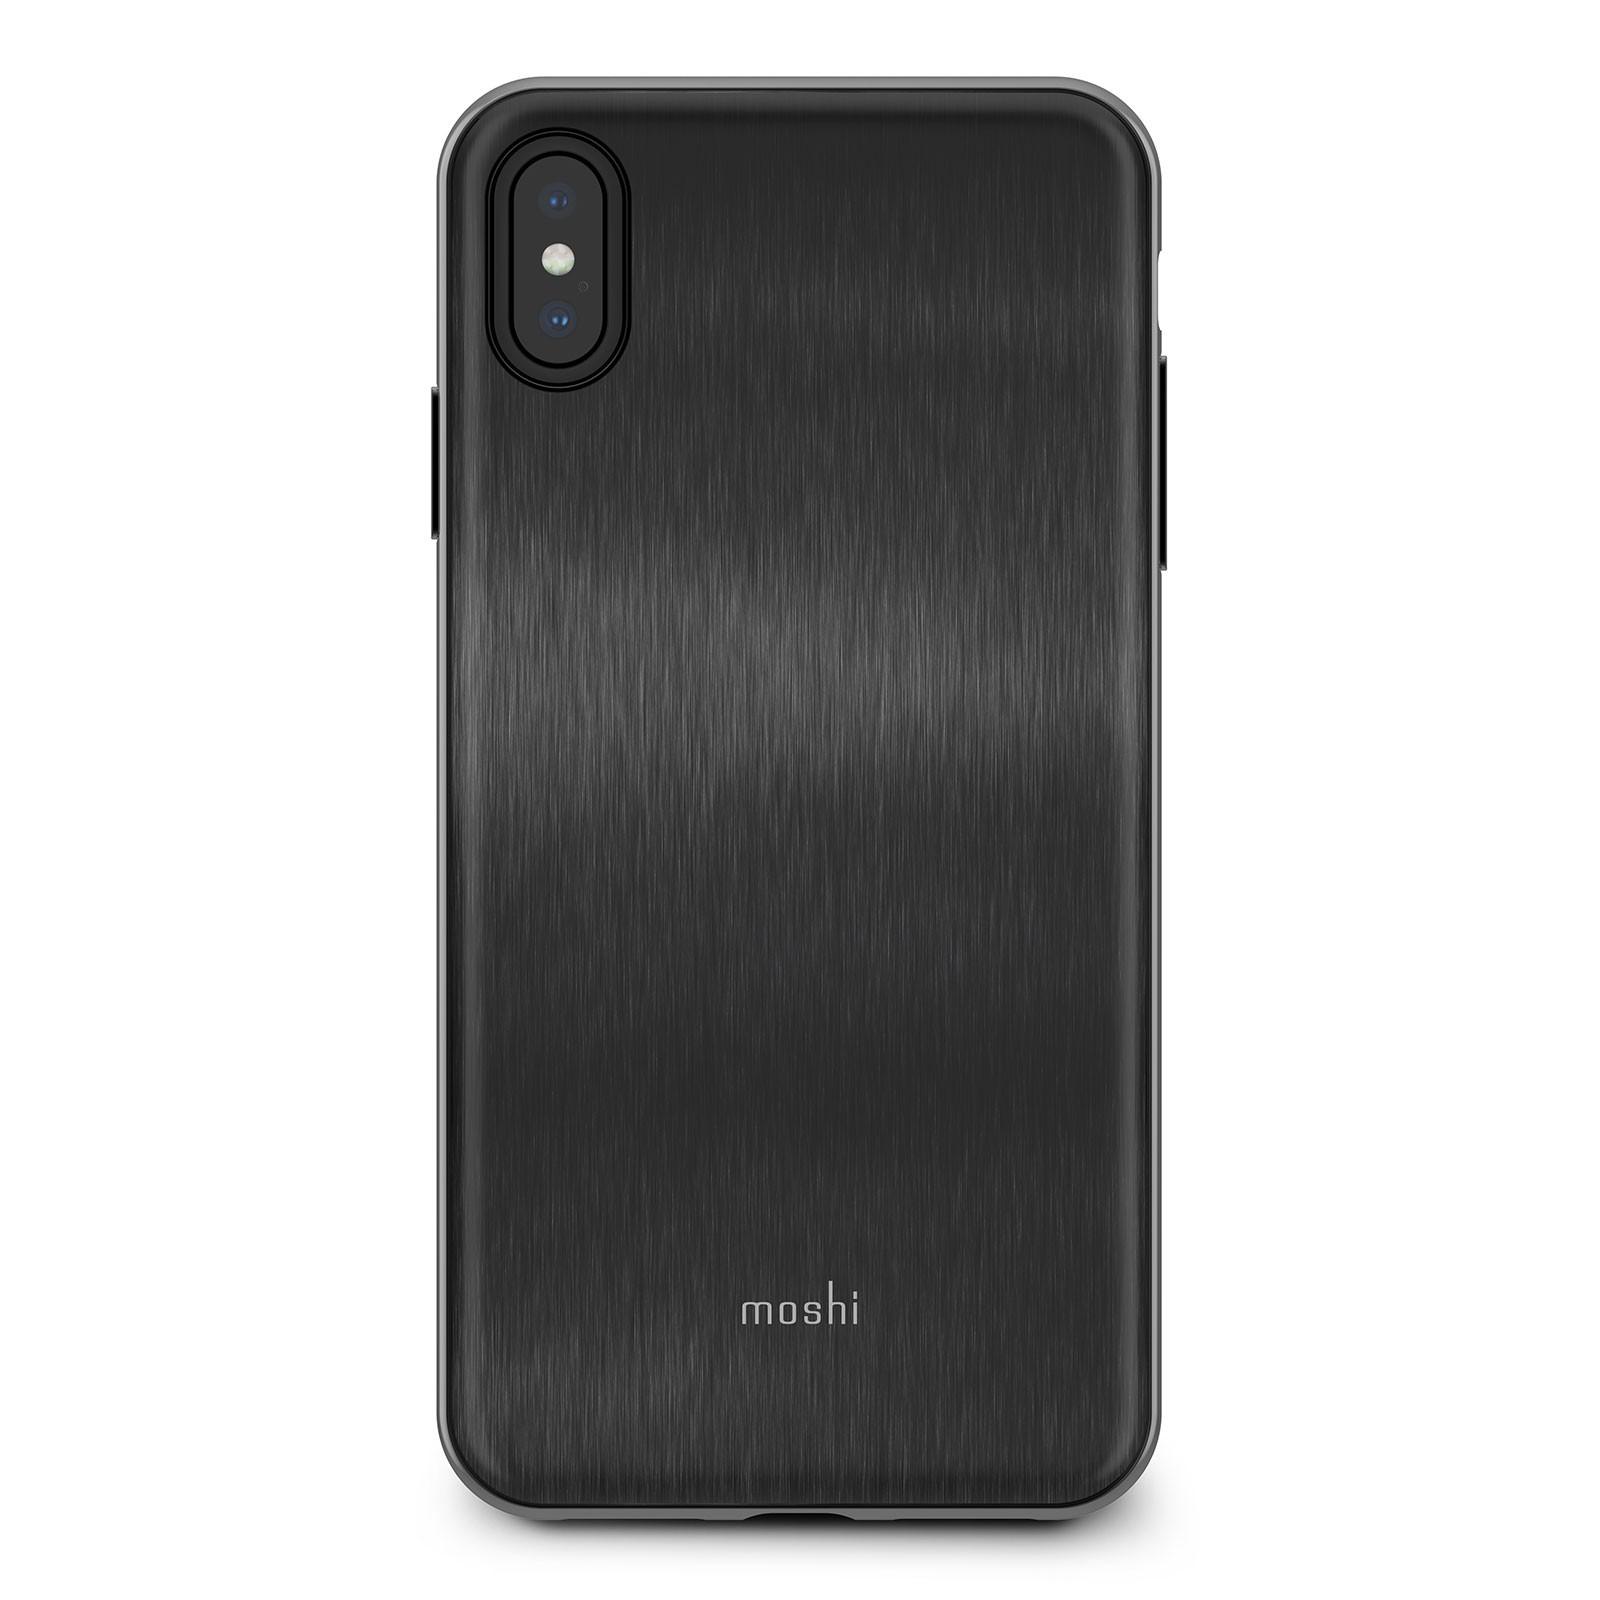 506b04b711e04b Moshi iPhone XS Max iGlaze - Armour Black - iSTYLE - Apple Premium ...